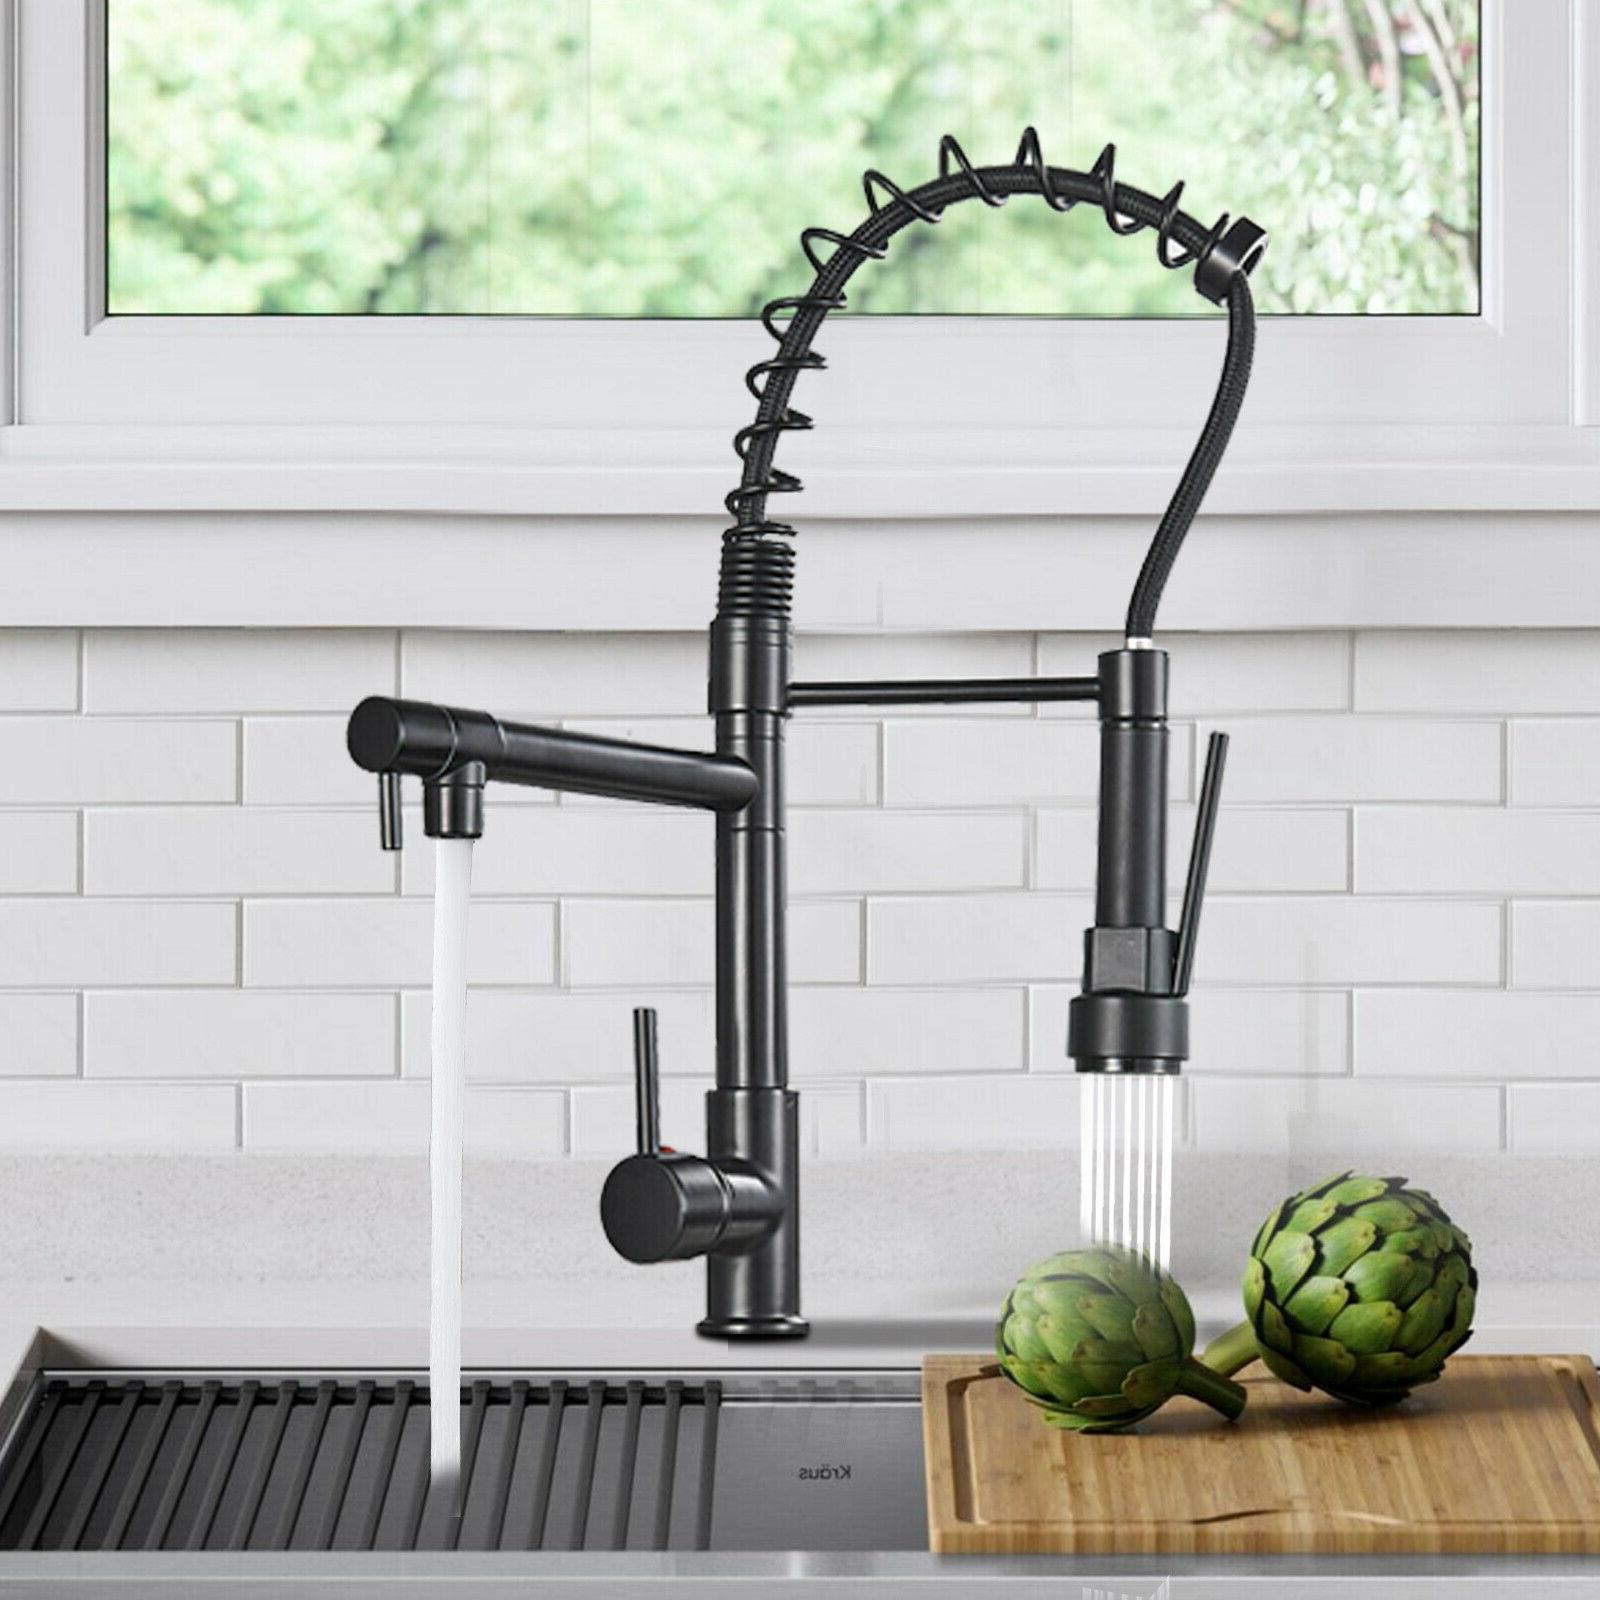 brushed nickel kitchen faucet swivel